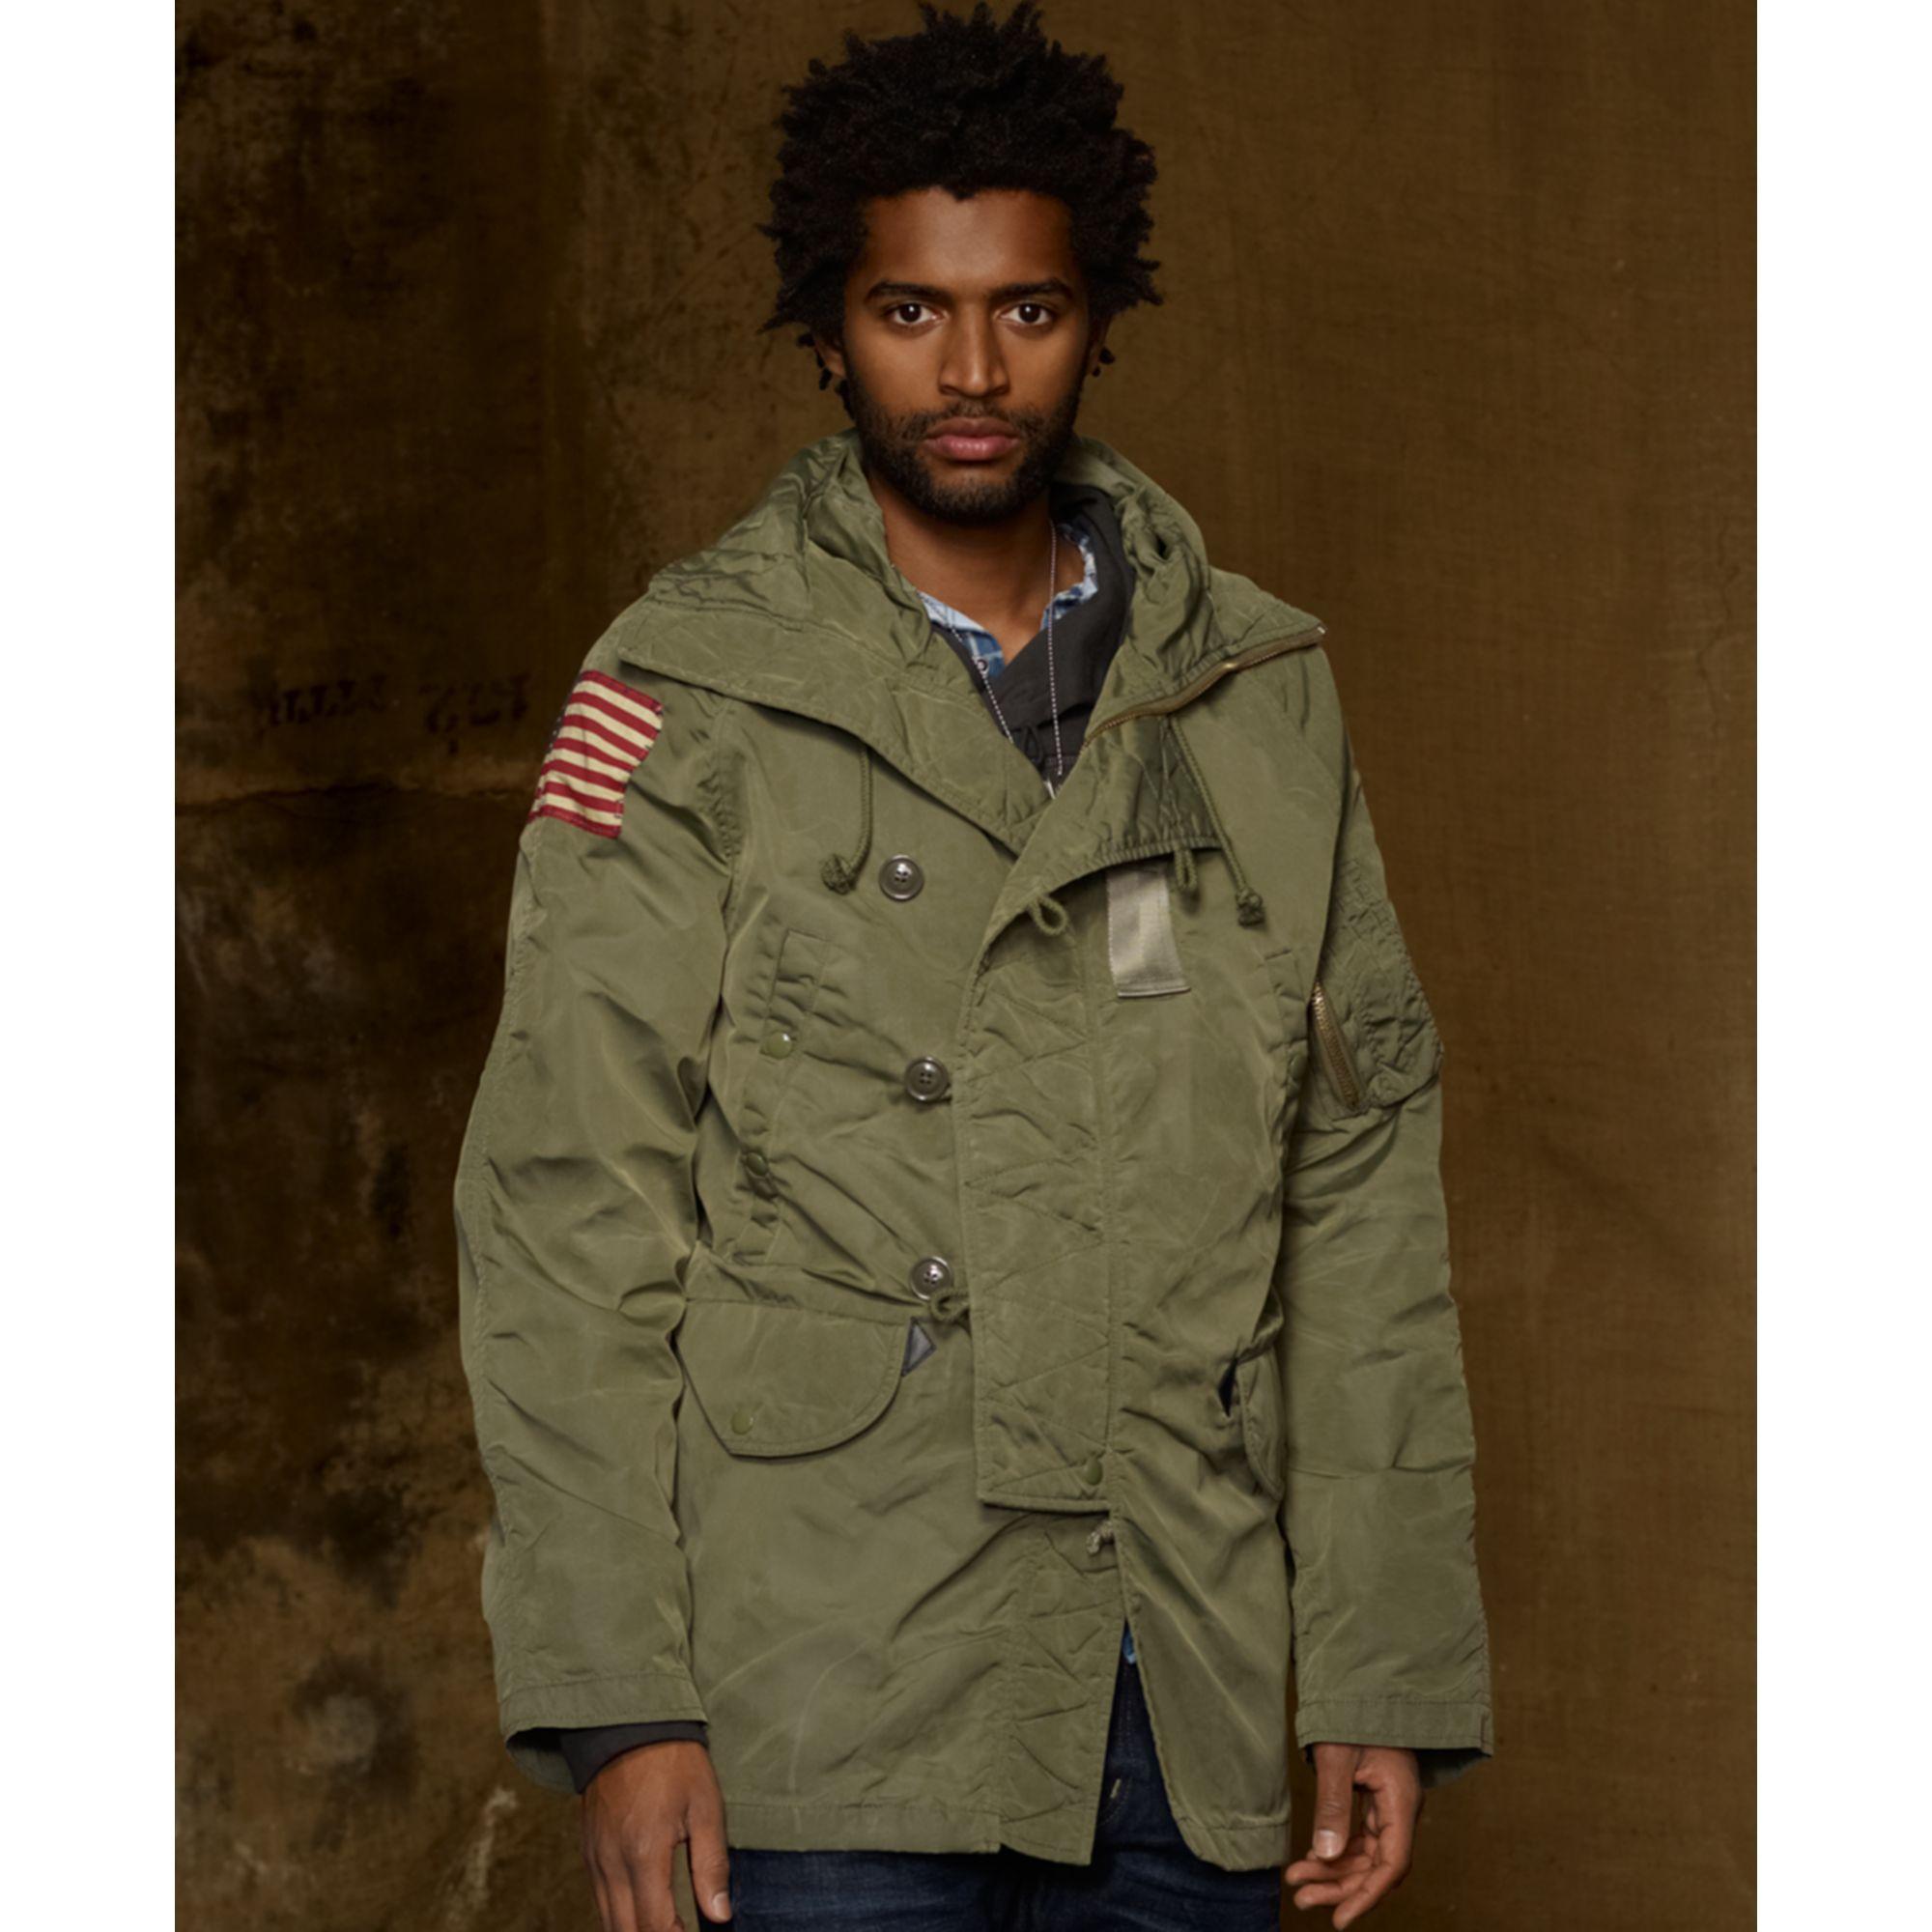 a47e9667c6aa2 Denim & Supply Ralph Lauren Down Snorkel Jacket in Green for Men - Lyst